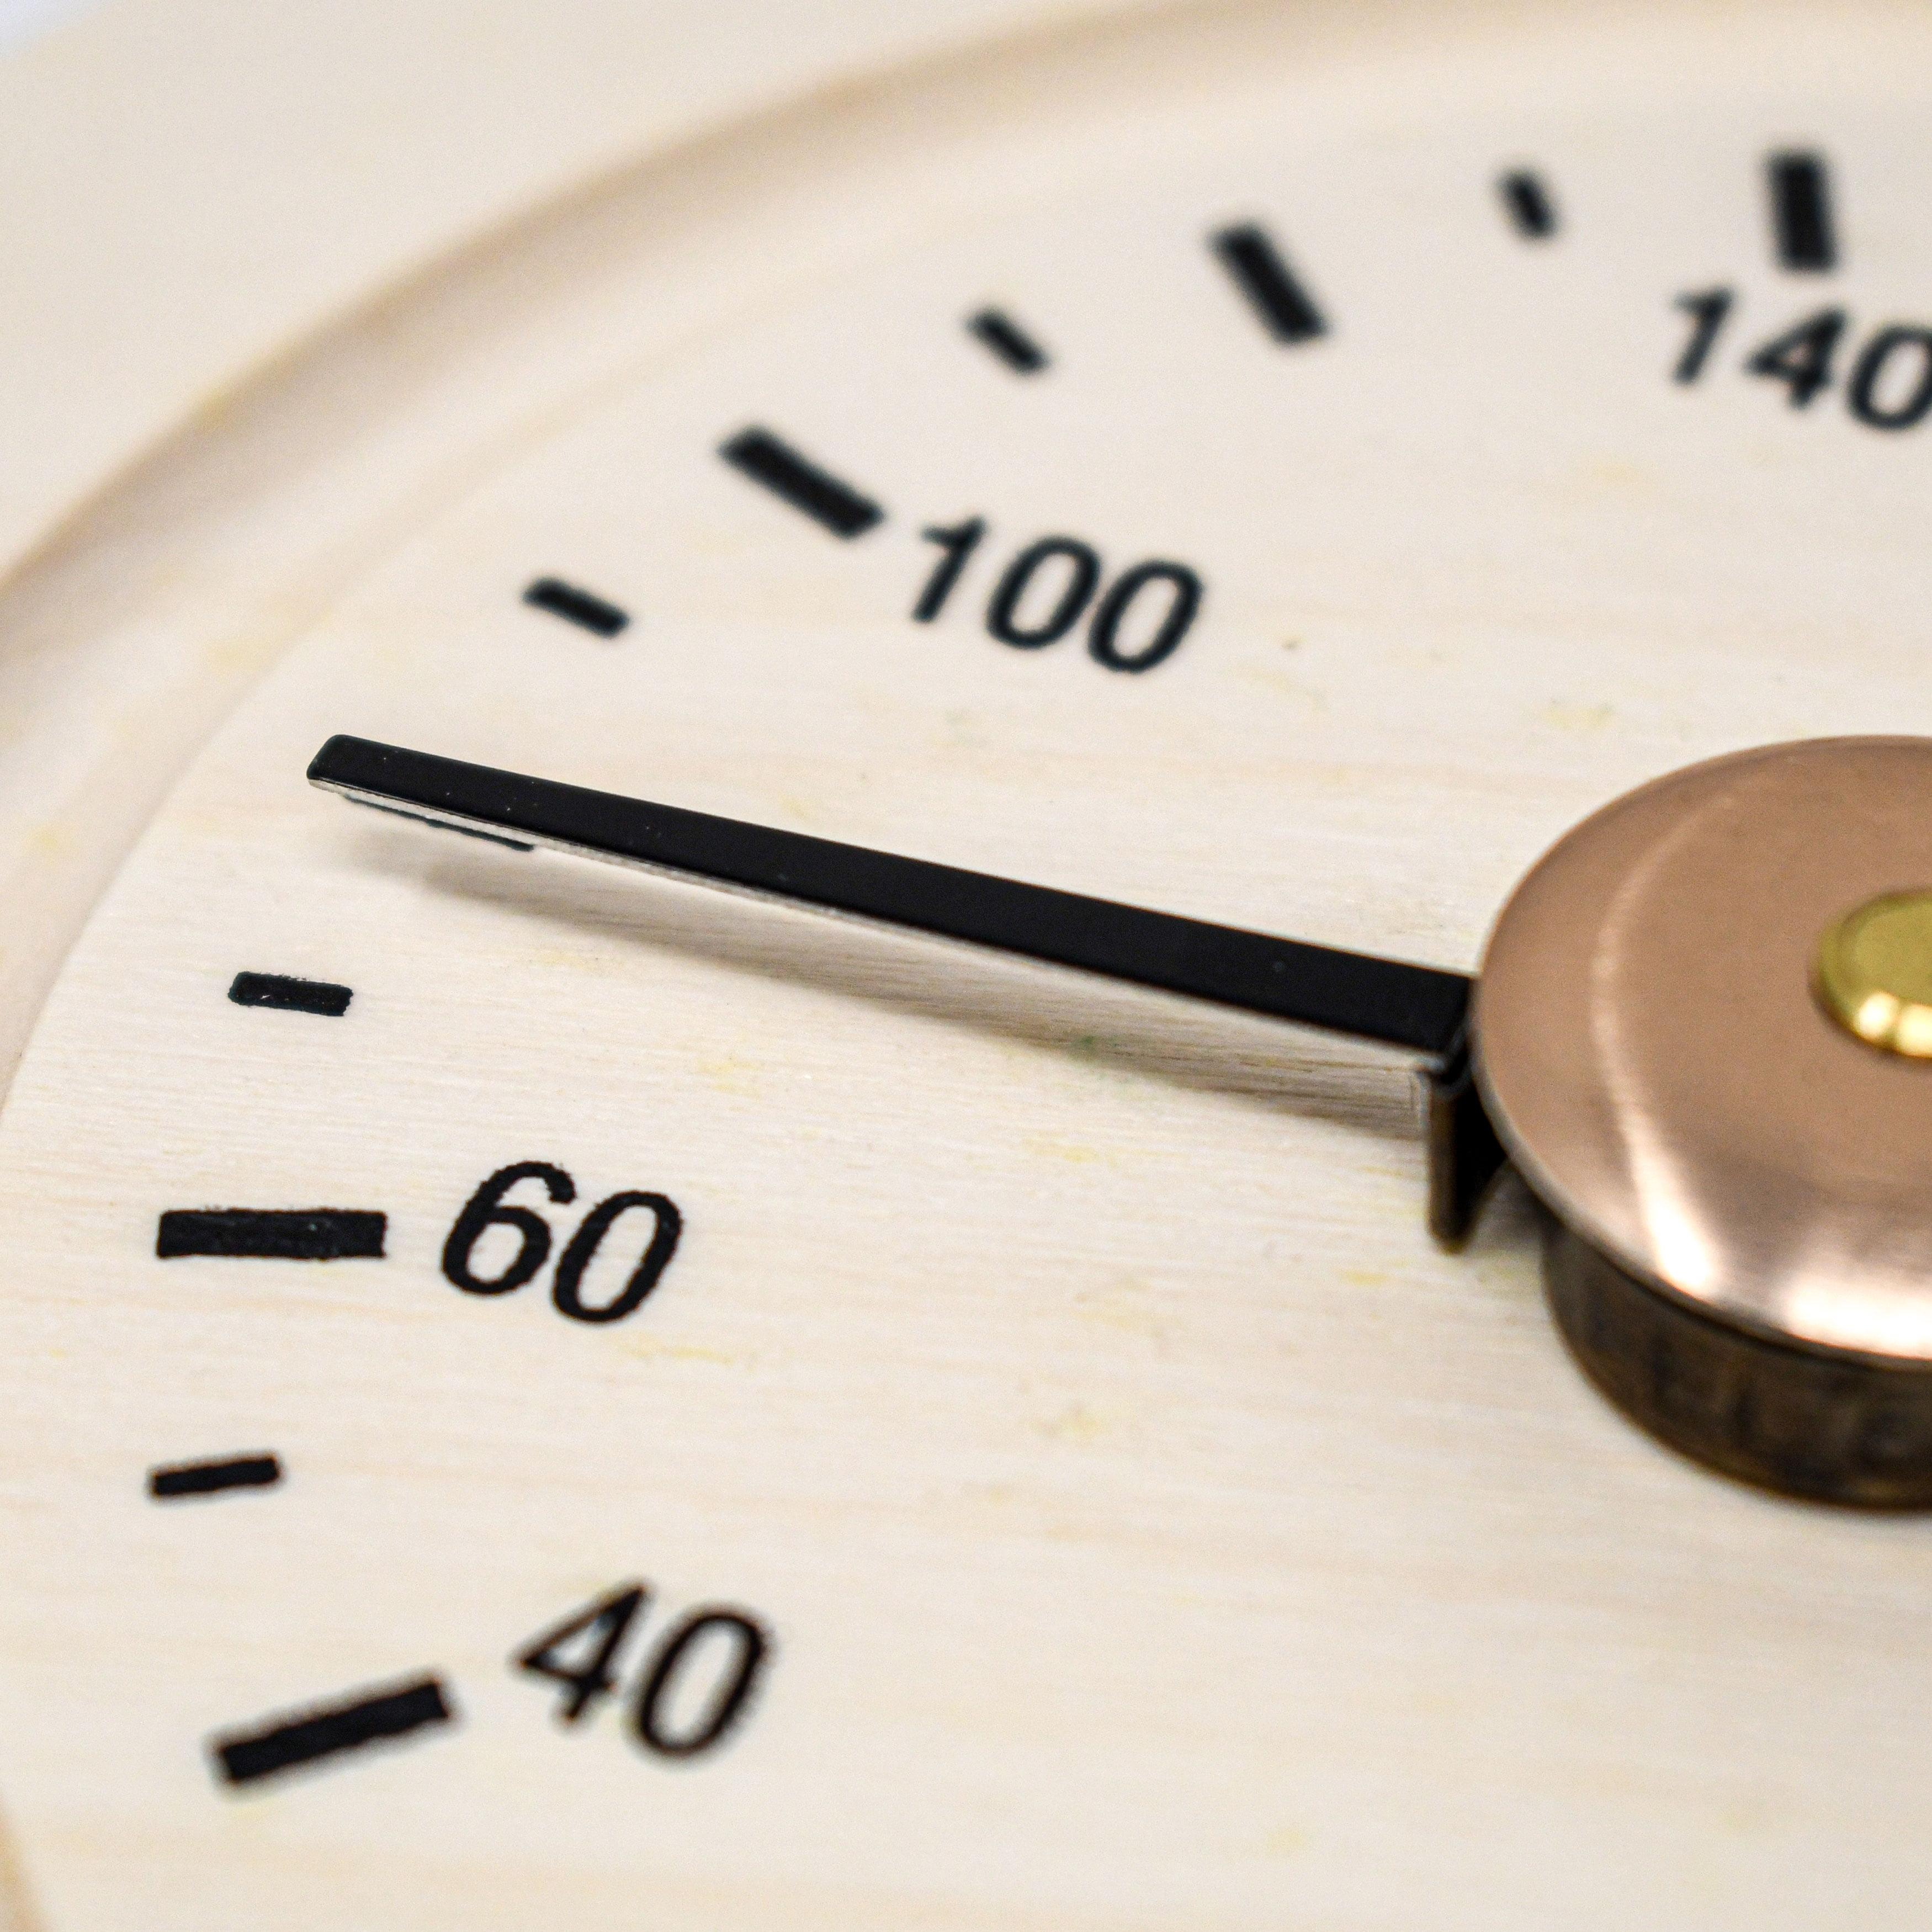 Aleko Wj02 Round Pine Wood Sauna Thermometer Gage In Fahrenheit Walmart Com Walmart Com